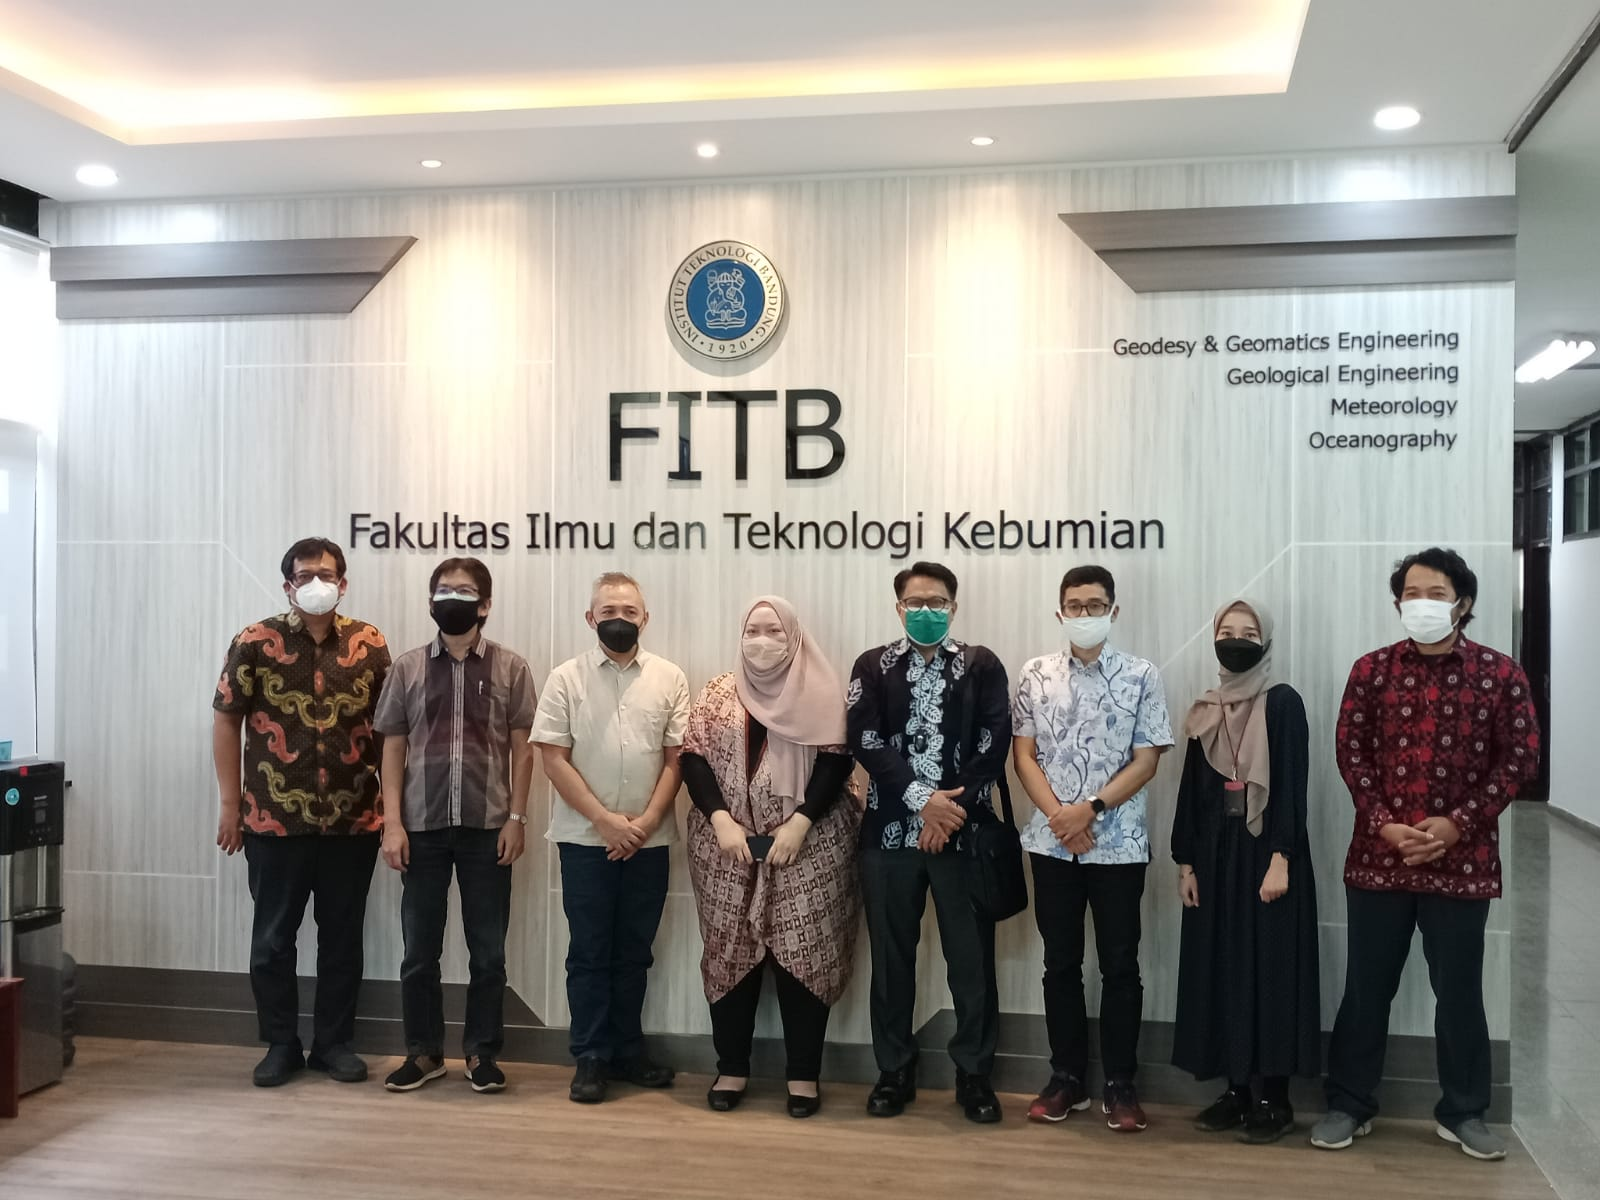 Selasa, 21 September 2021 Perdana Sidang Tertutup Program Doktor FITB yang dilakukan secara Hybrid